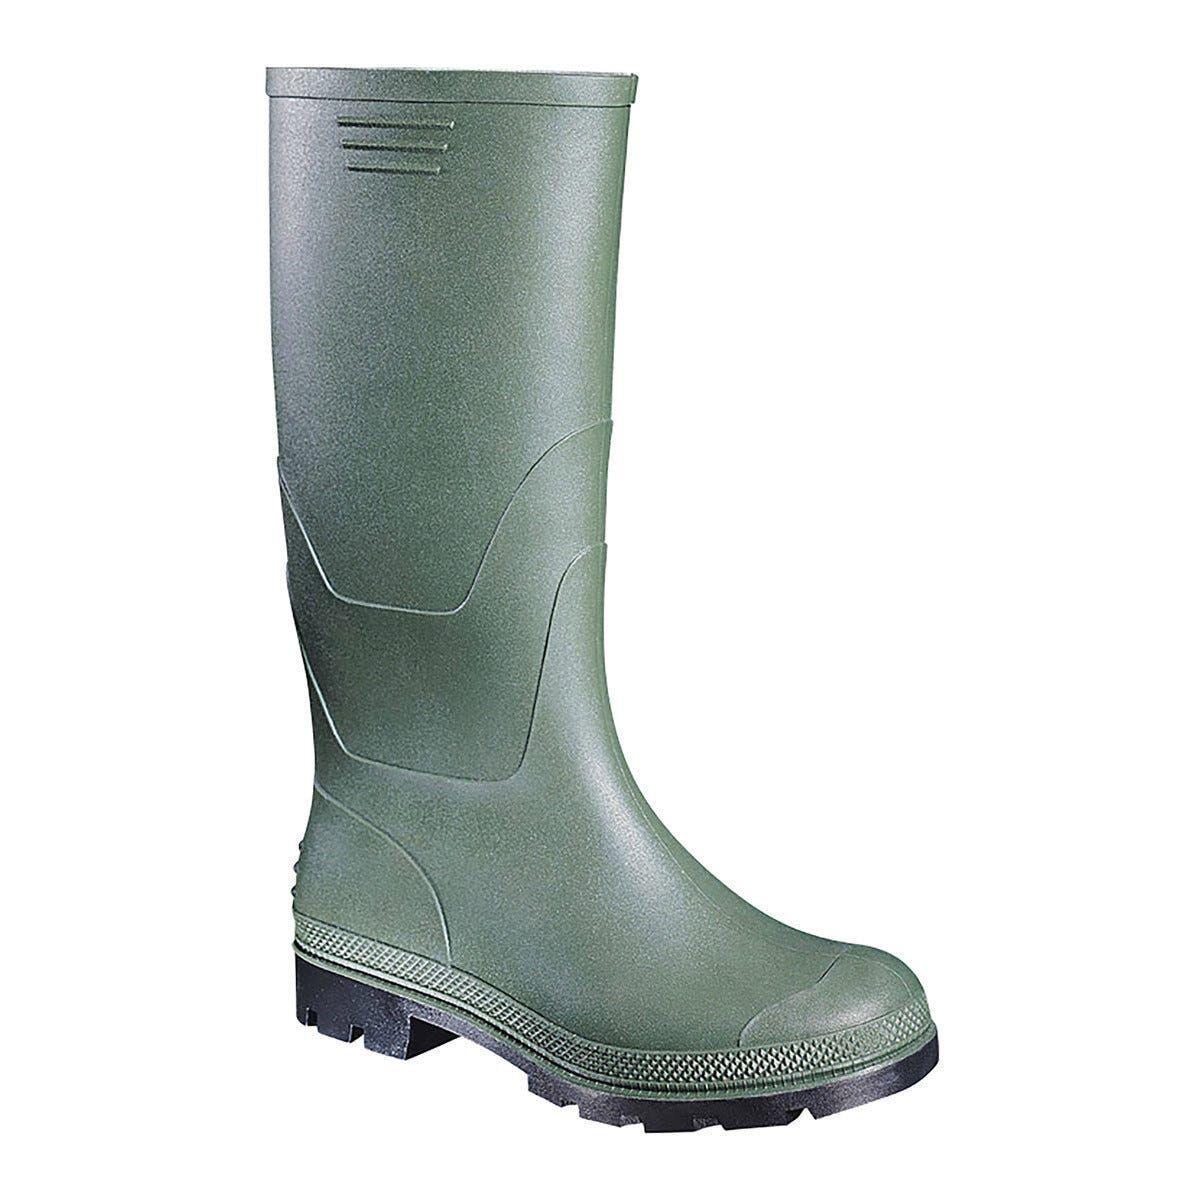 Stivale Ginocchio Pvc Misura 40 Boots Company